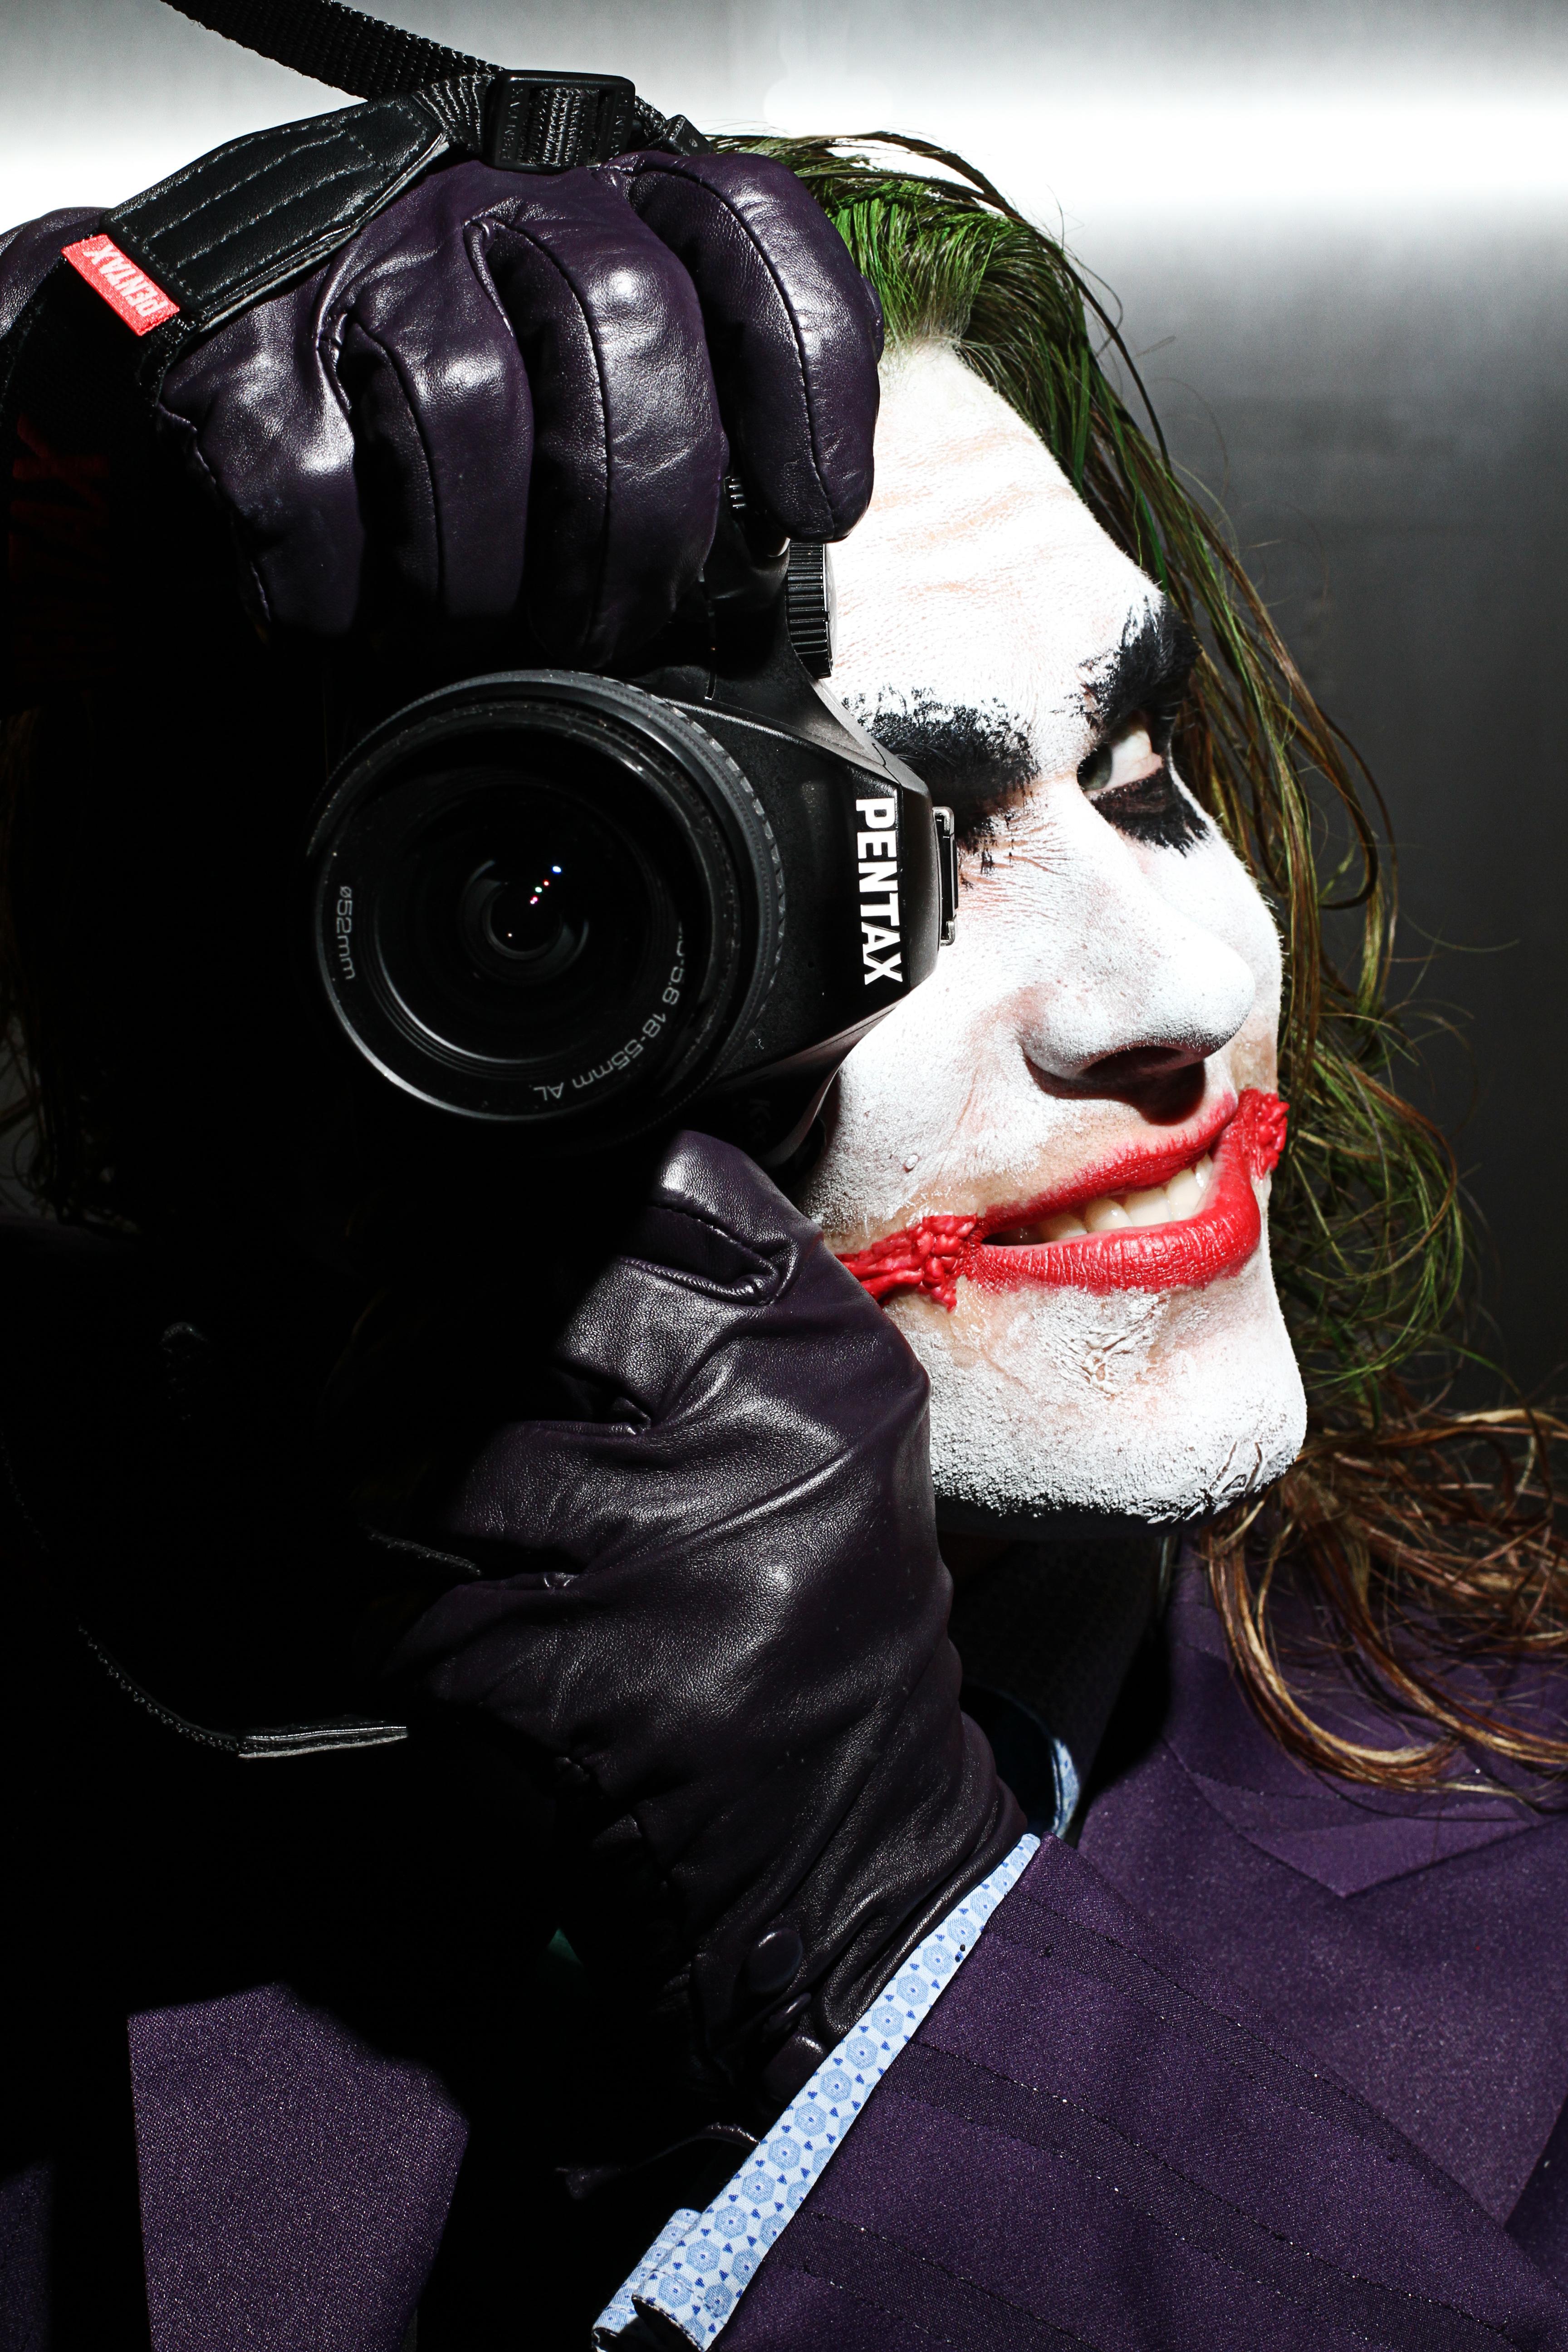 Killing Joke - Batman Comic ref for Joker Cosplay by Carancerth